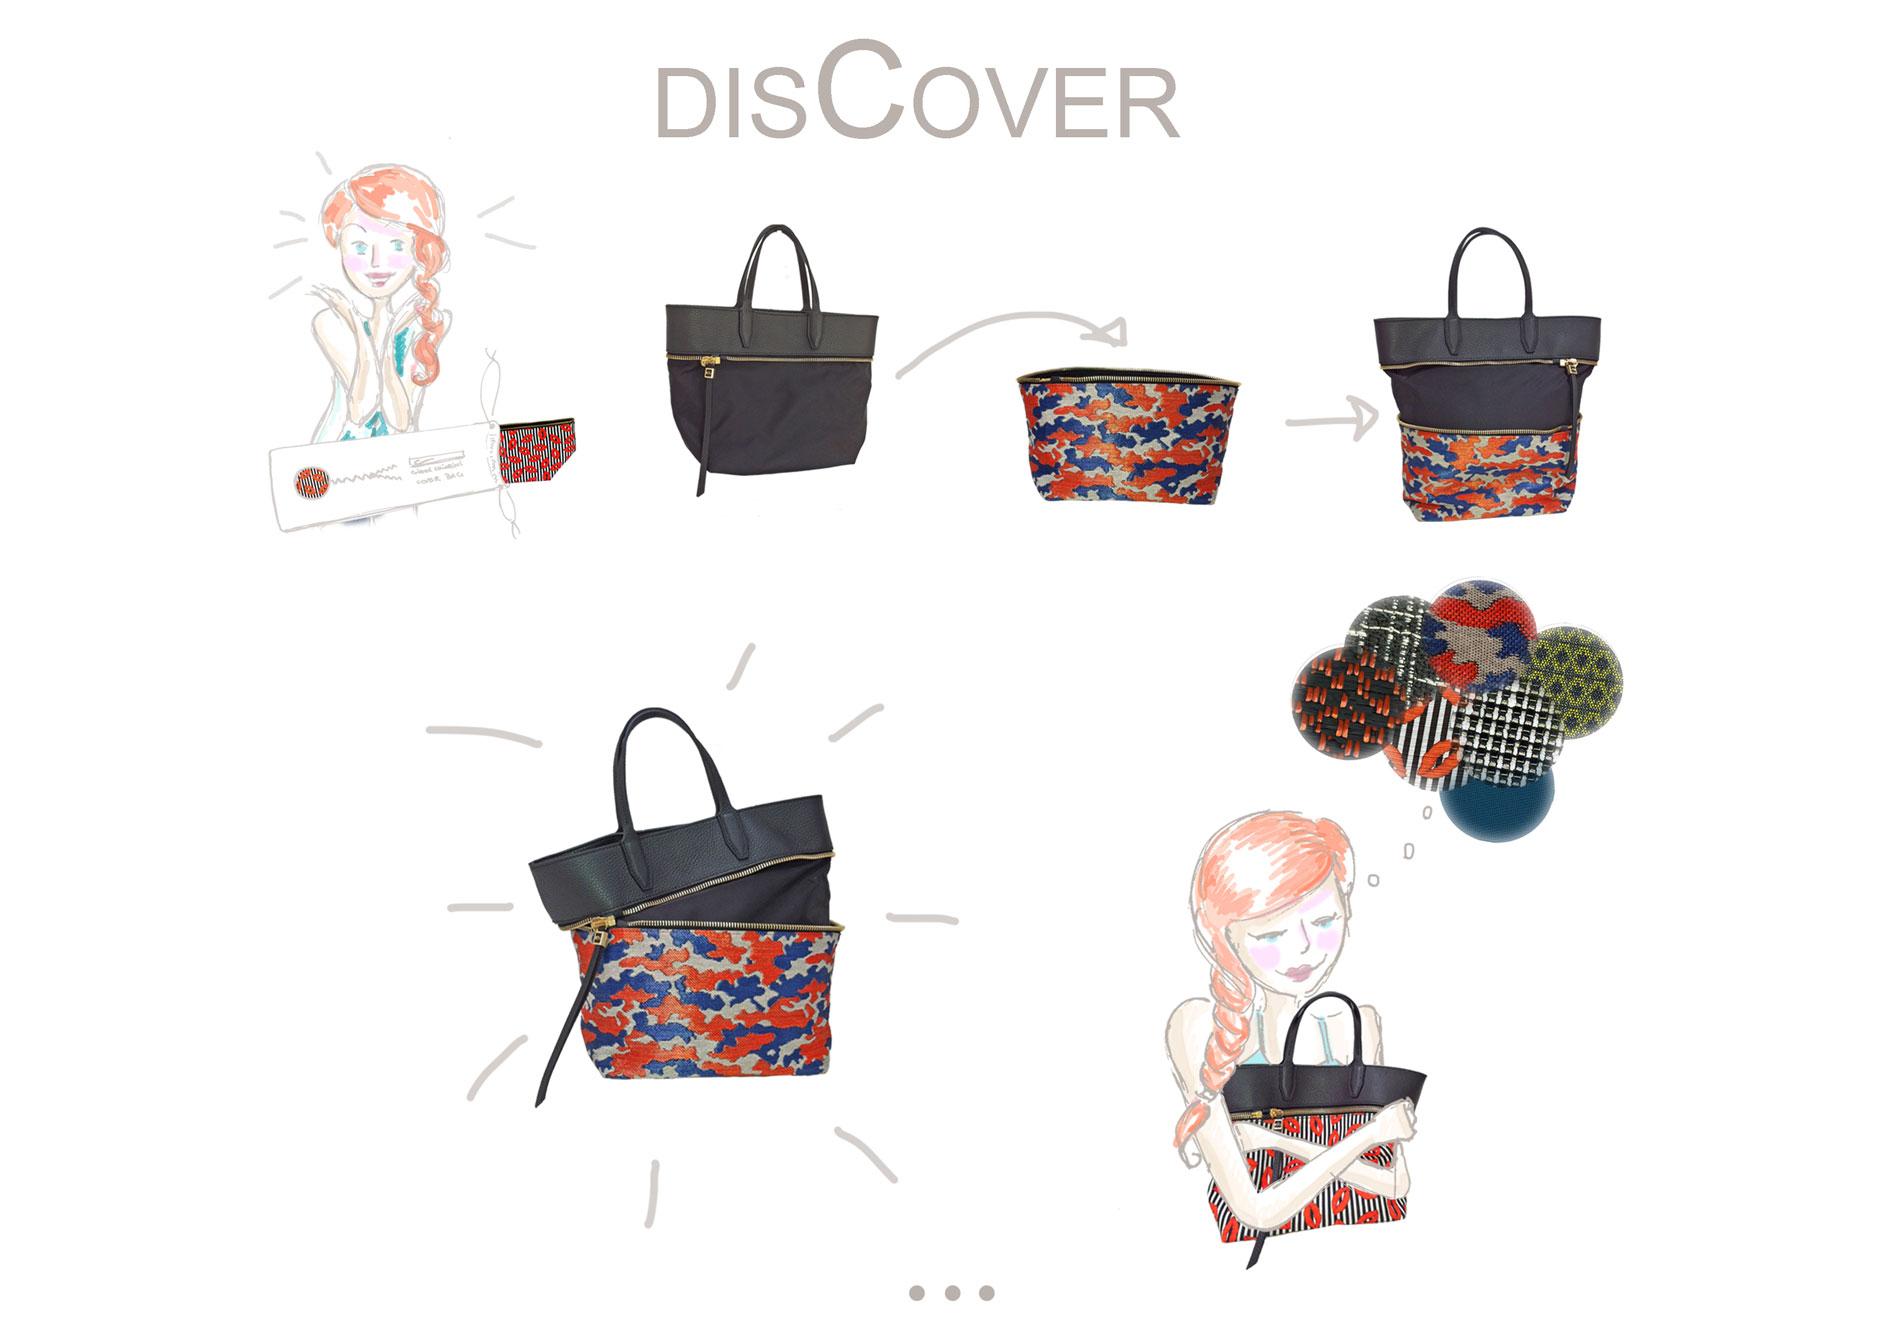 cover-bag-chiarini